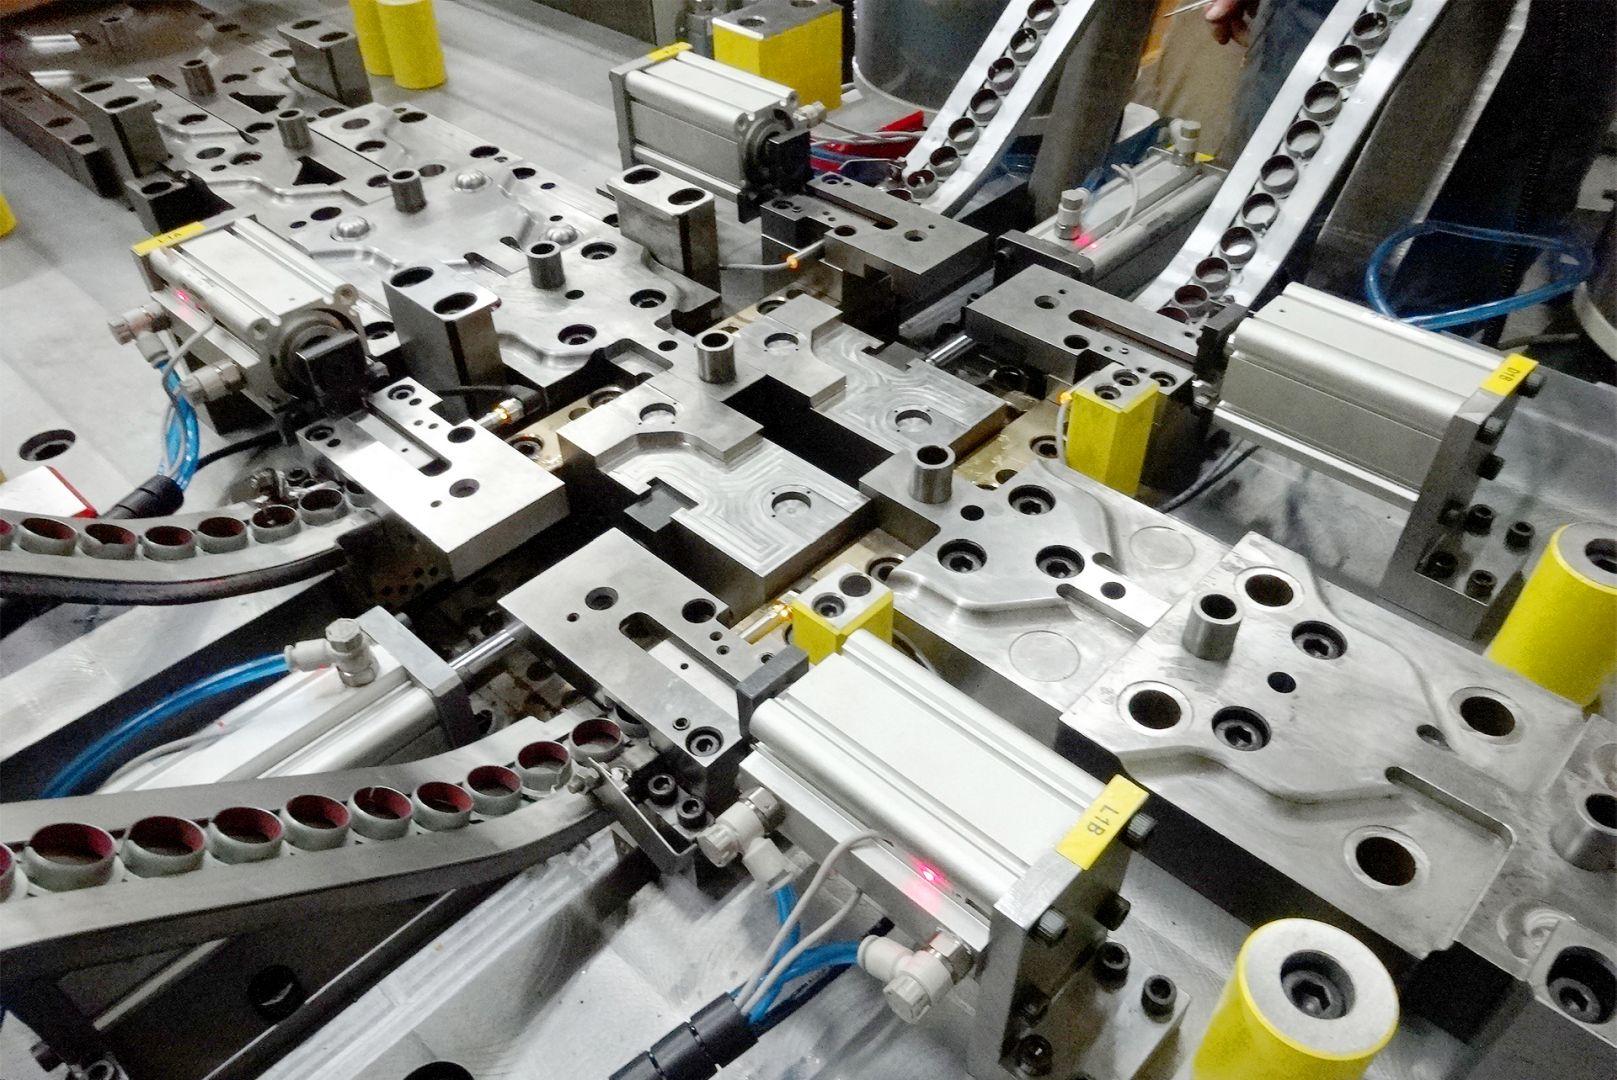 Toolshop–Werkzeugbau–orodjarstvo-4 Orodje za preoblikov plocevine _ slika 5a